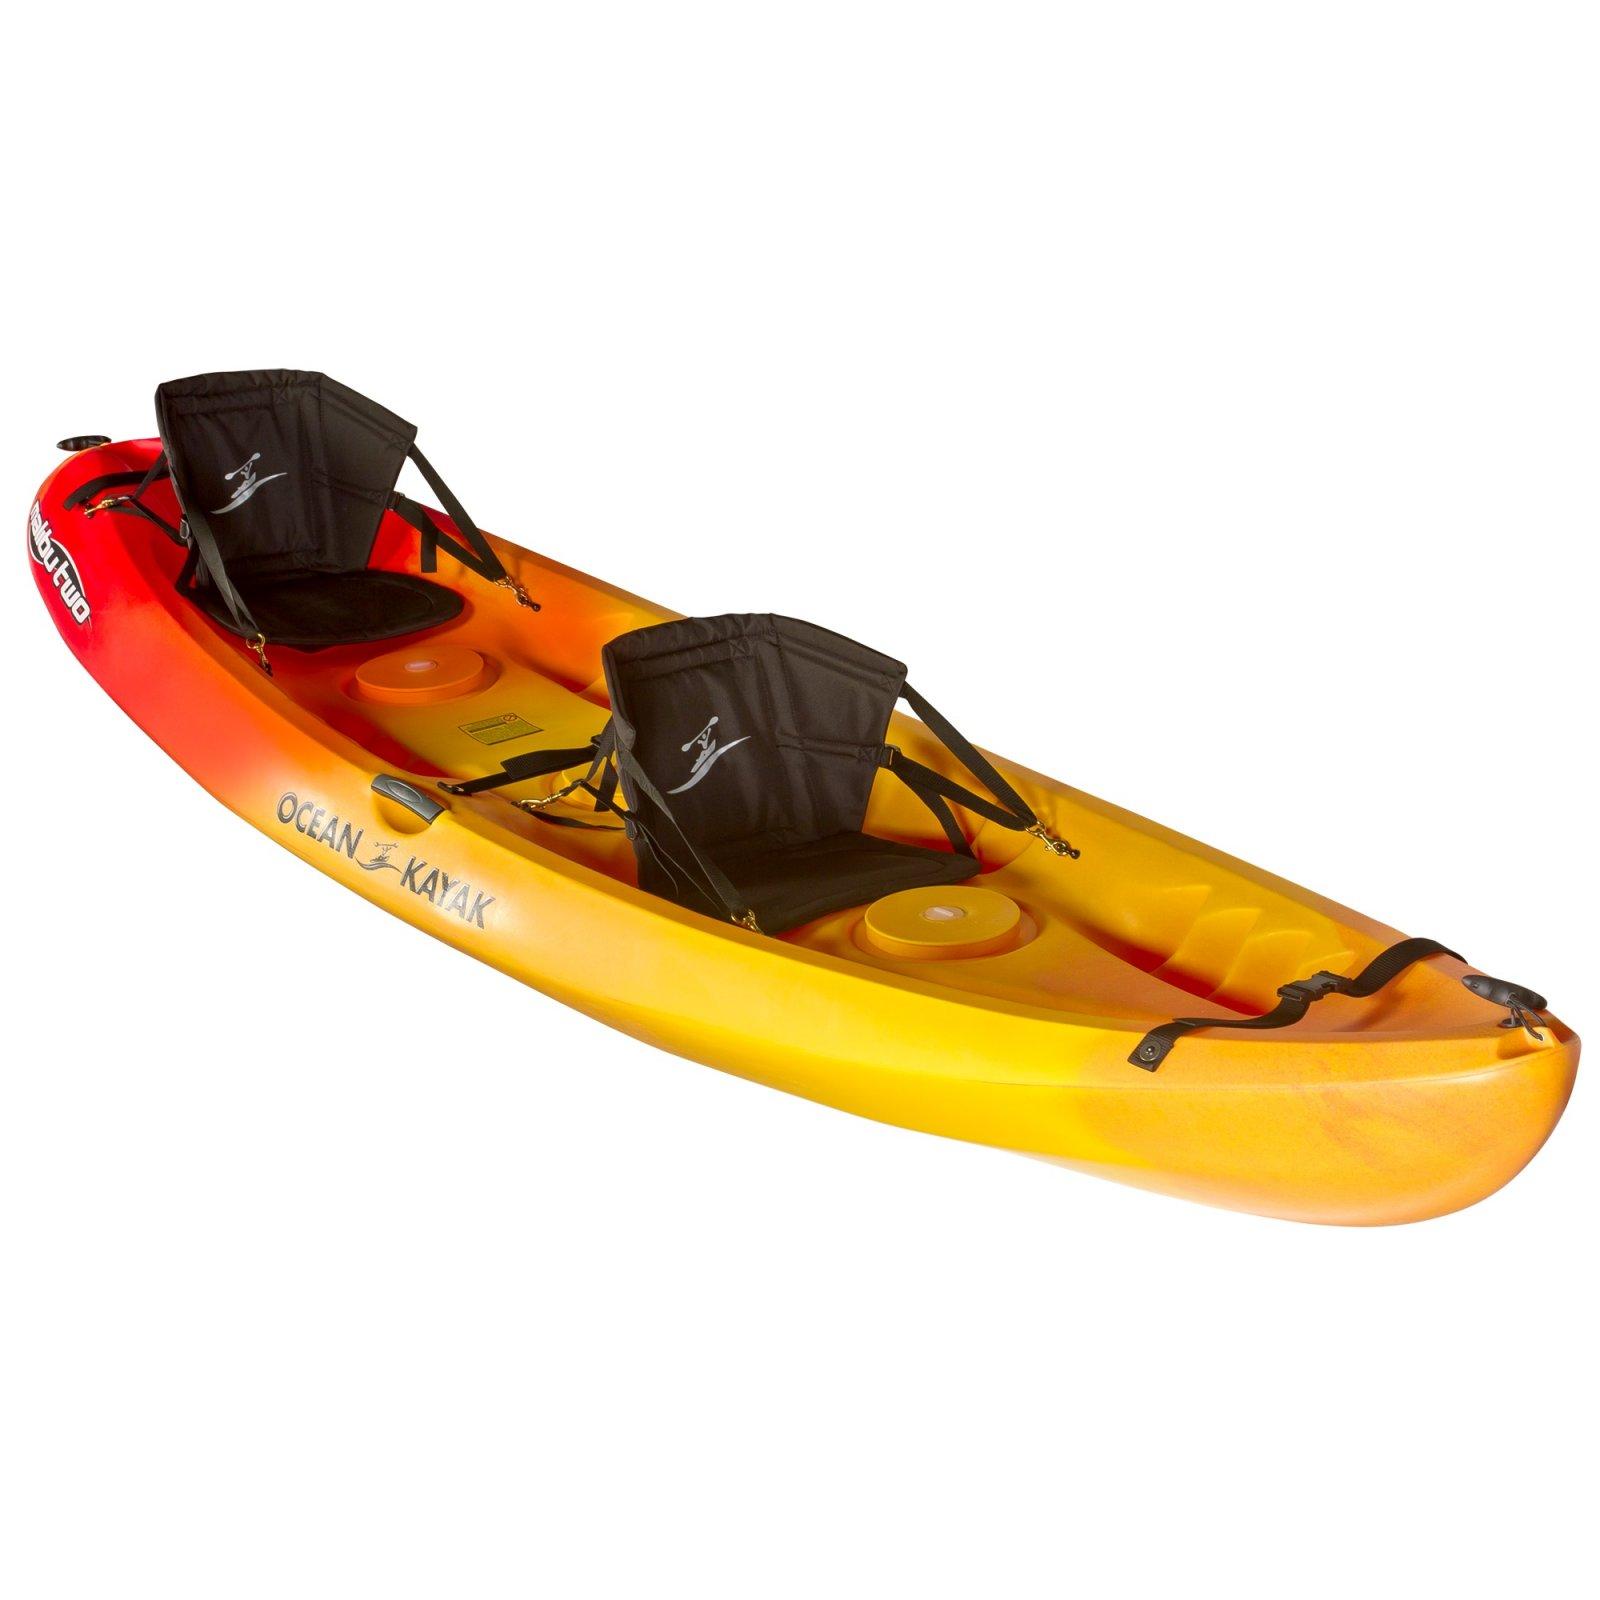 Ocean Kayak Malibu Two - Factory Second